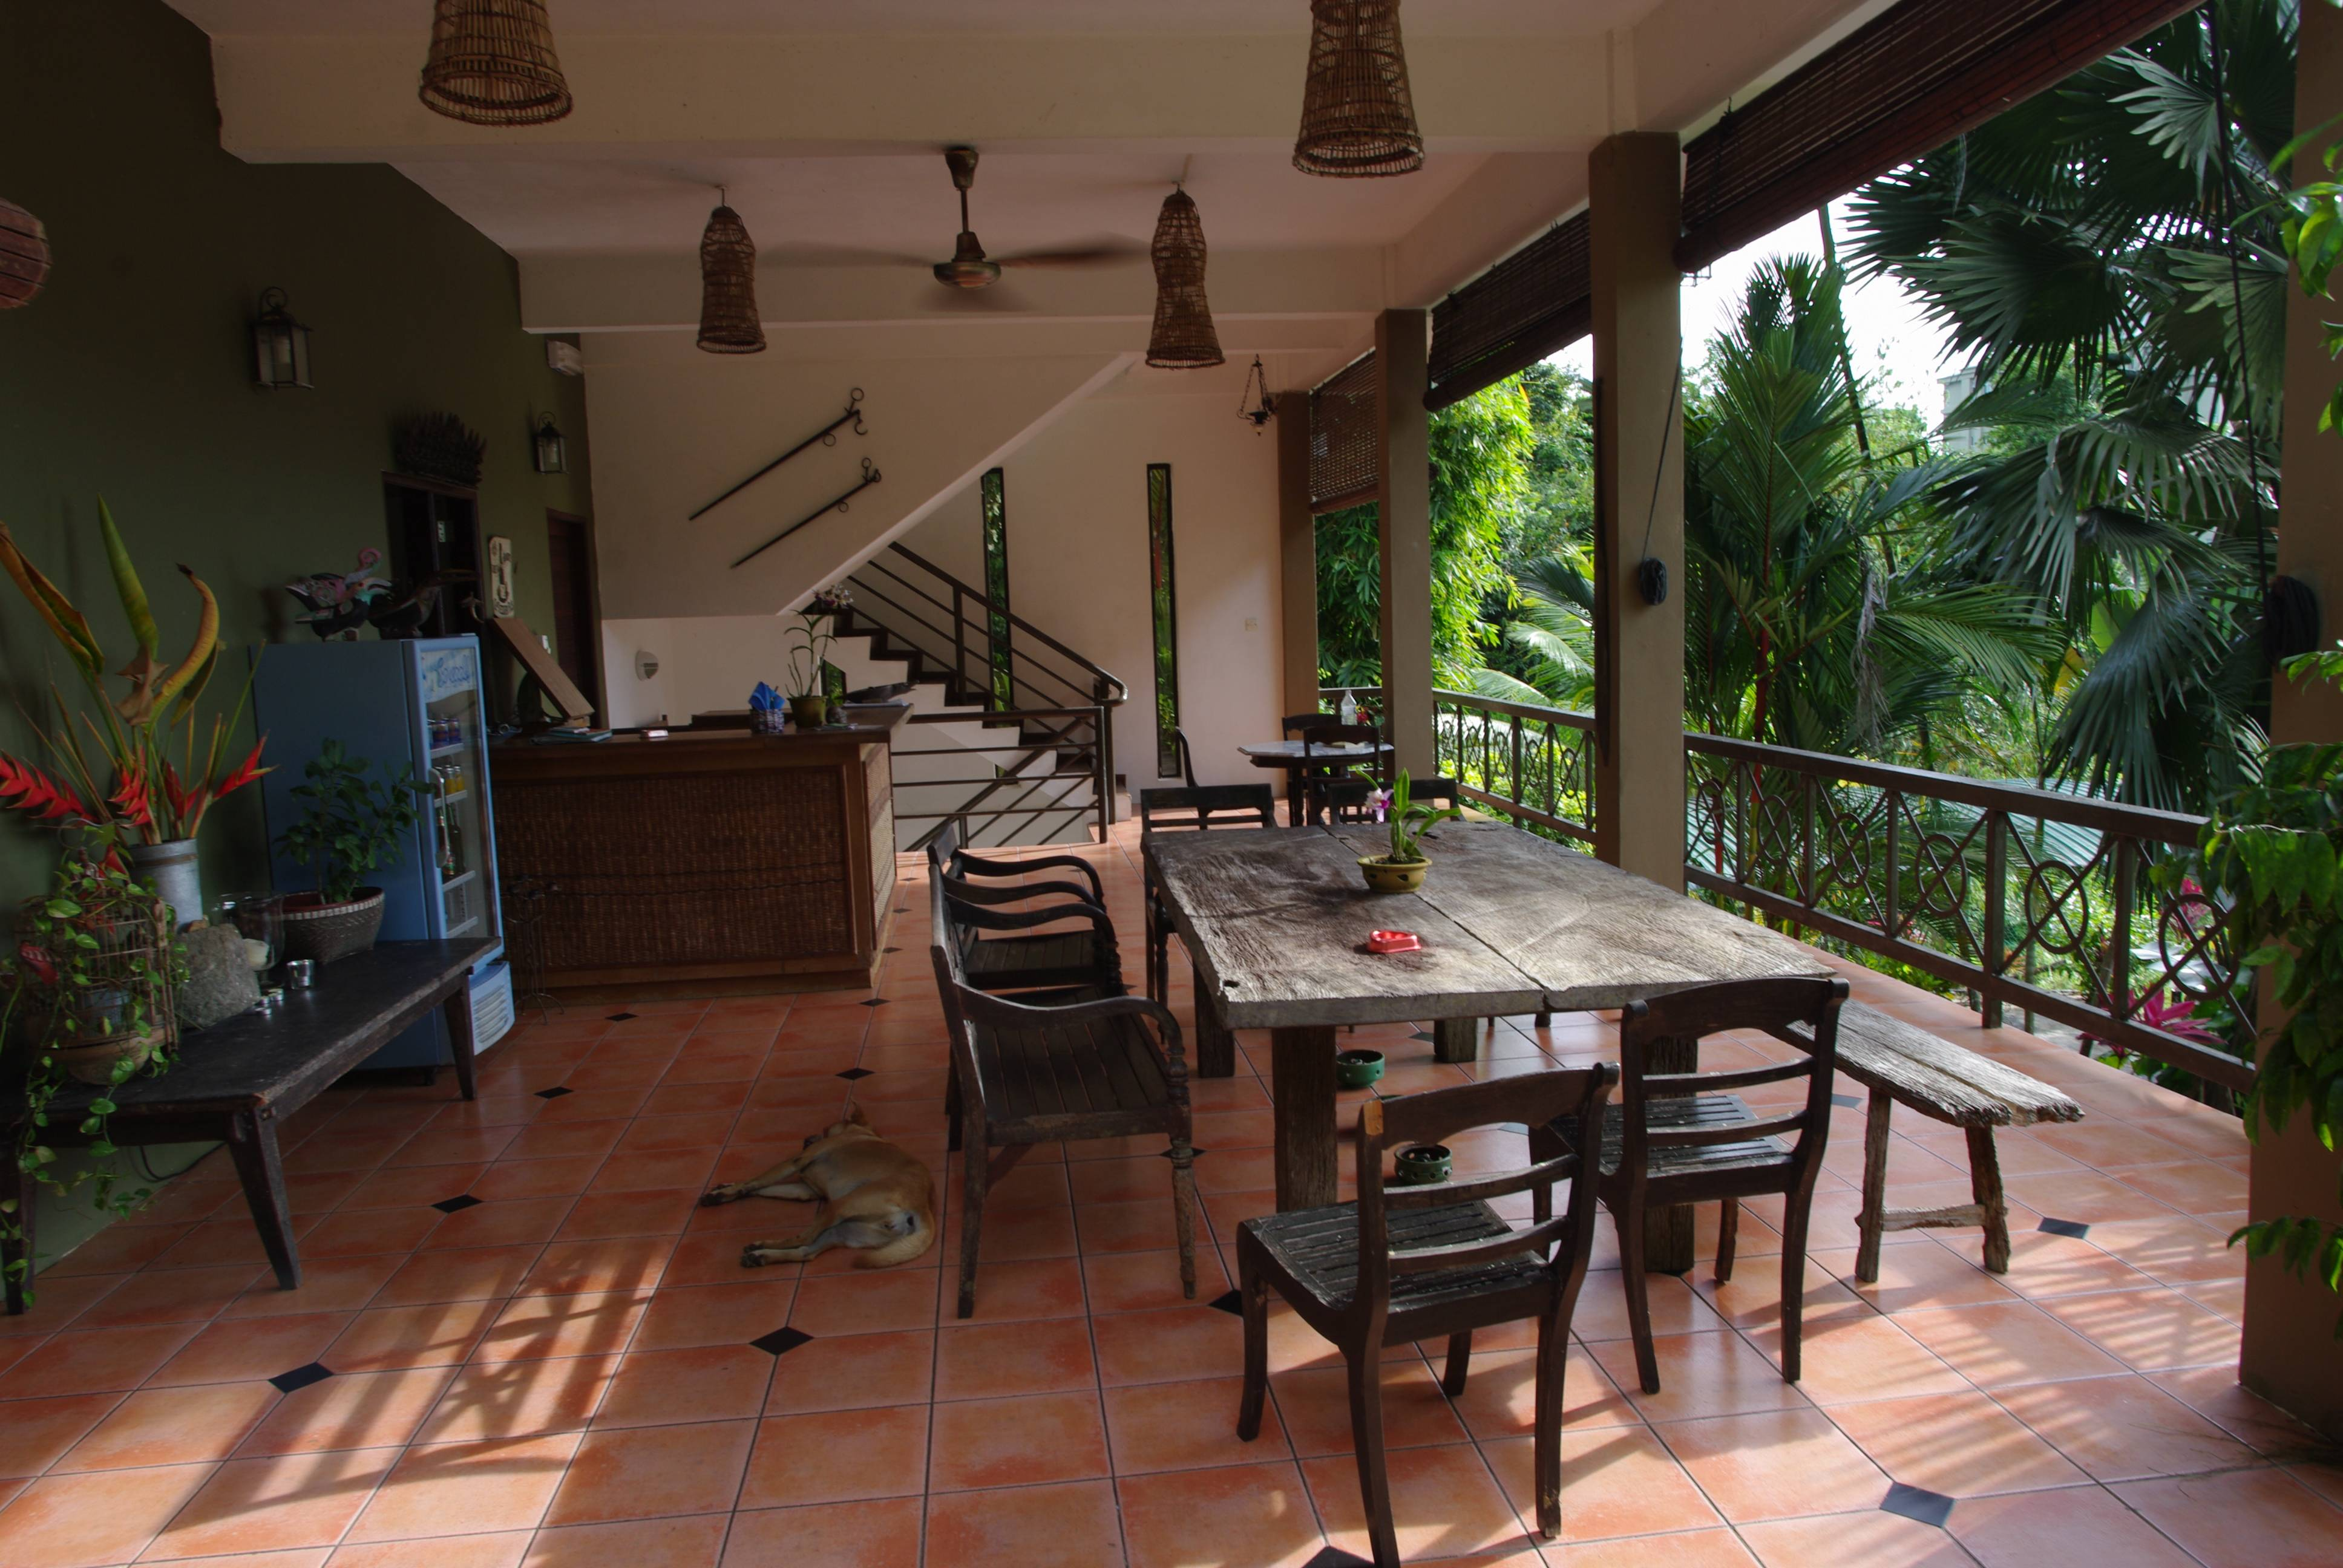 Photo 2: Meilleur hébergement du Sarawak (Bornéo)